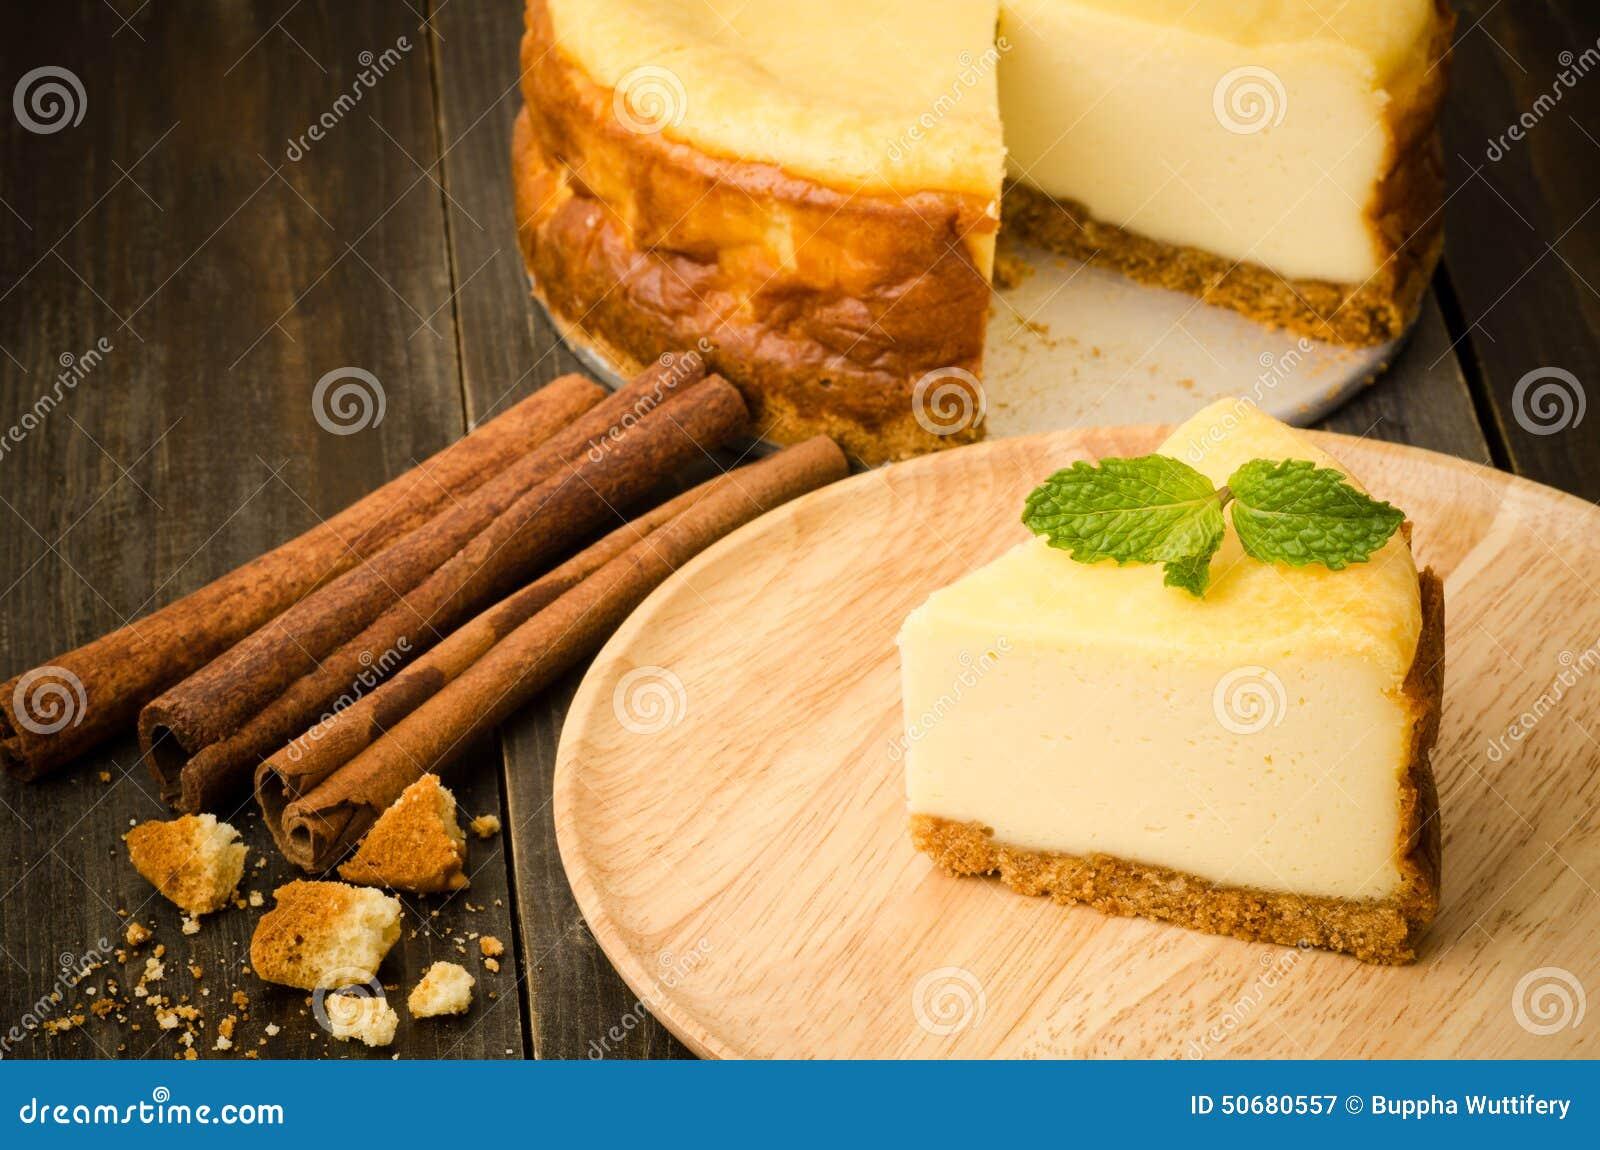 Download 蛋糕干酪樱桃可口点心果酱牌照白色 库存图片. 图片 包括有 点心, 干酪, 可口, 鲜美, 自创, 膳食 - 50680557